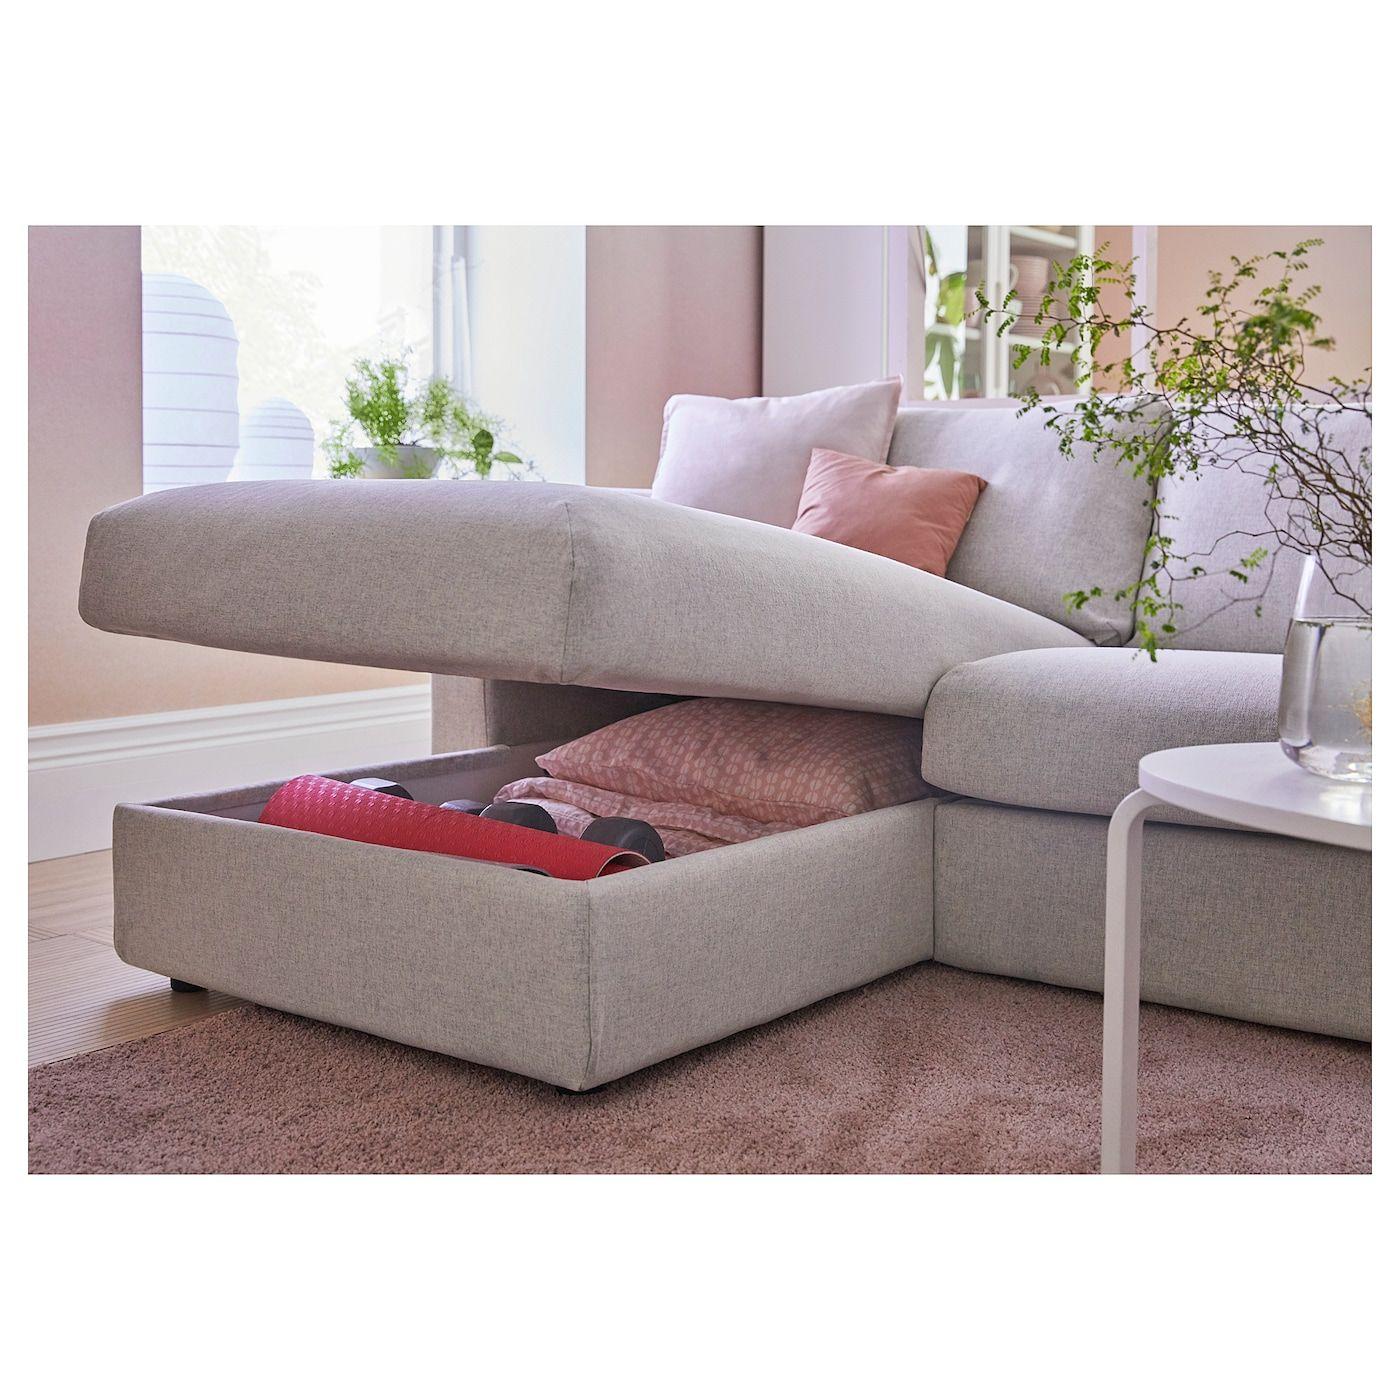 Vimle 3er Bettsofa Mit Recamiere Gunnared Beige Ikea Deutschland Sofa Bed With Chaise Cozy Sofa Sofa Back Cushions